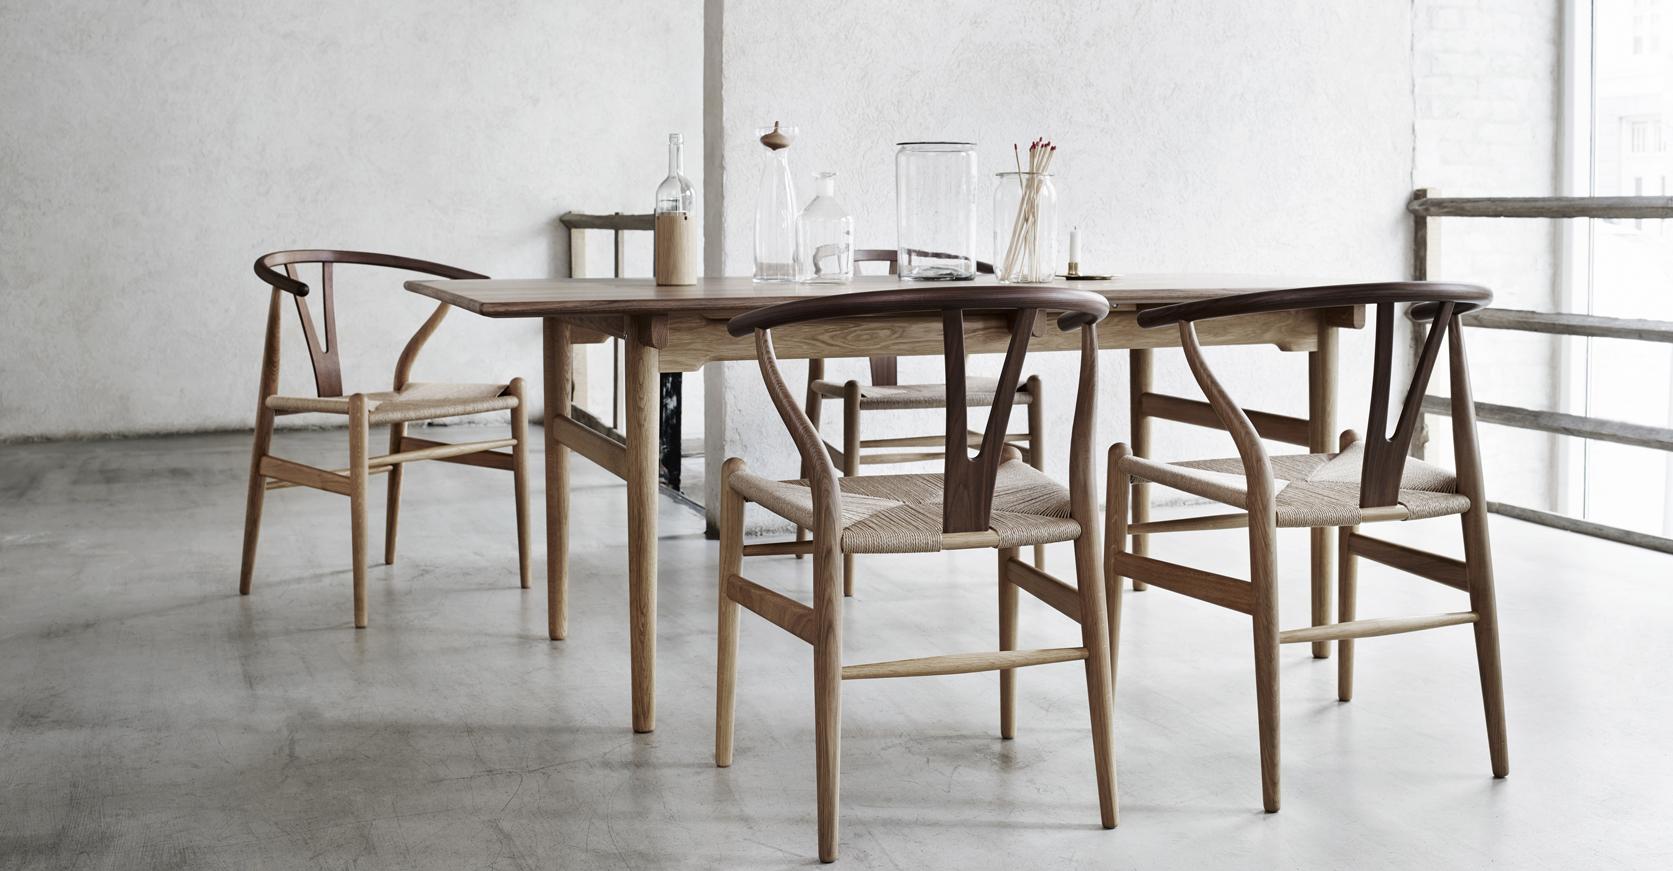 ch24 wishbone chair carl hansen son. Black Bedroom Furniture Sets. Home Design Ideas